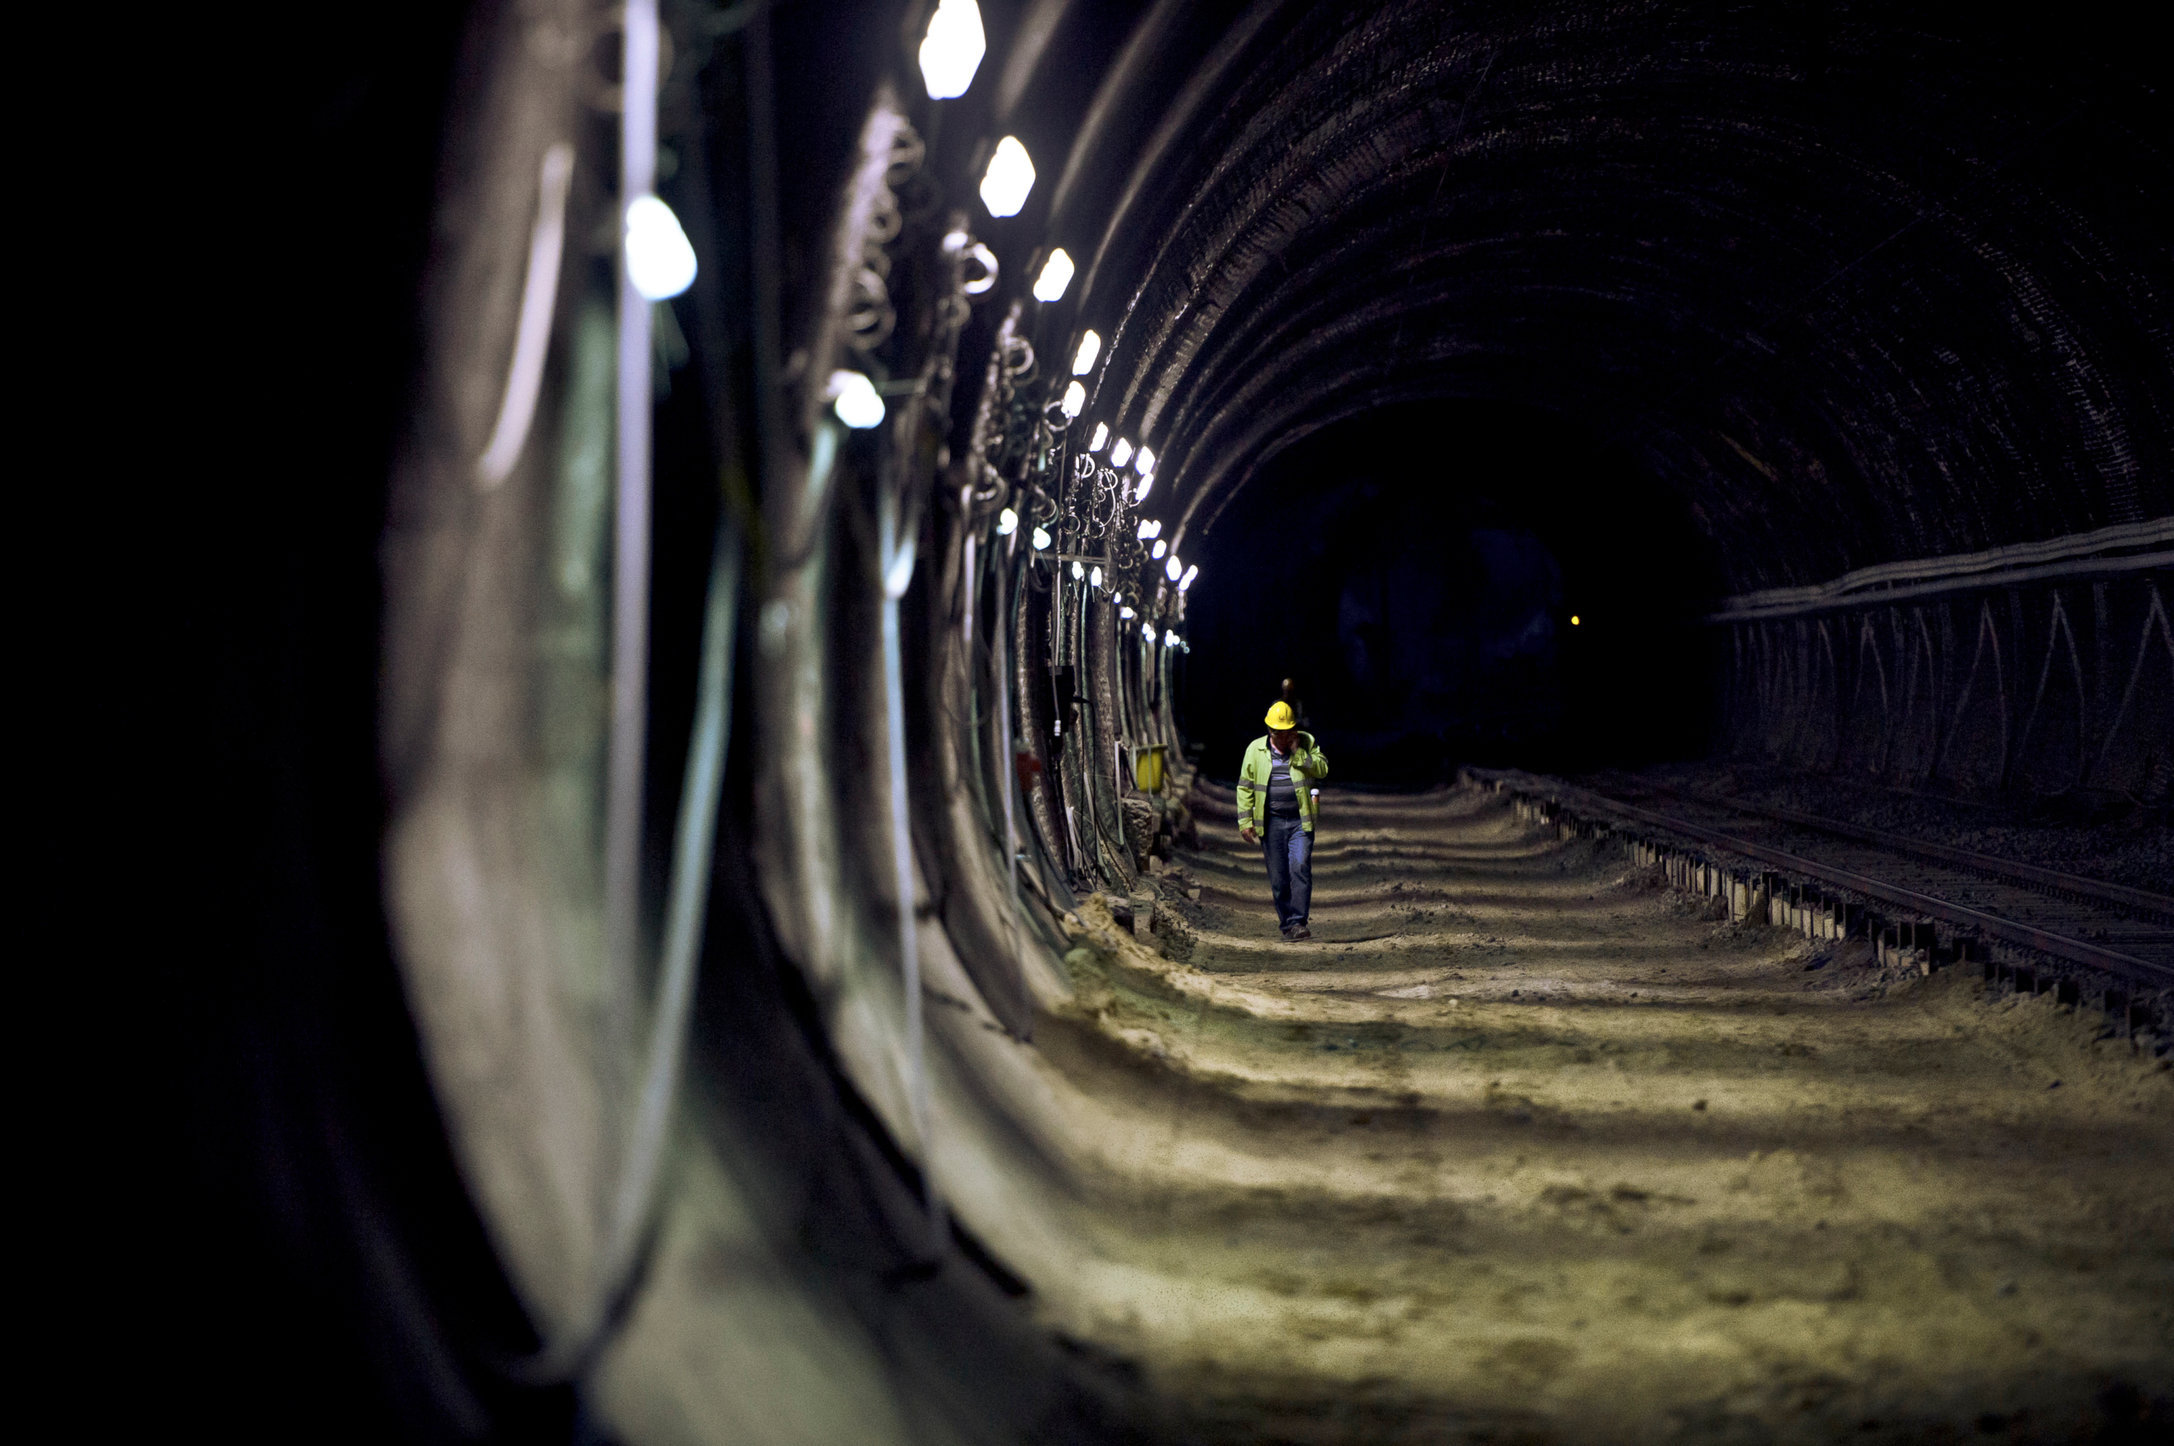 EH_120701_Tunnel_Schuman-Josaphat_025.jpg